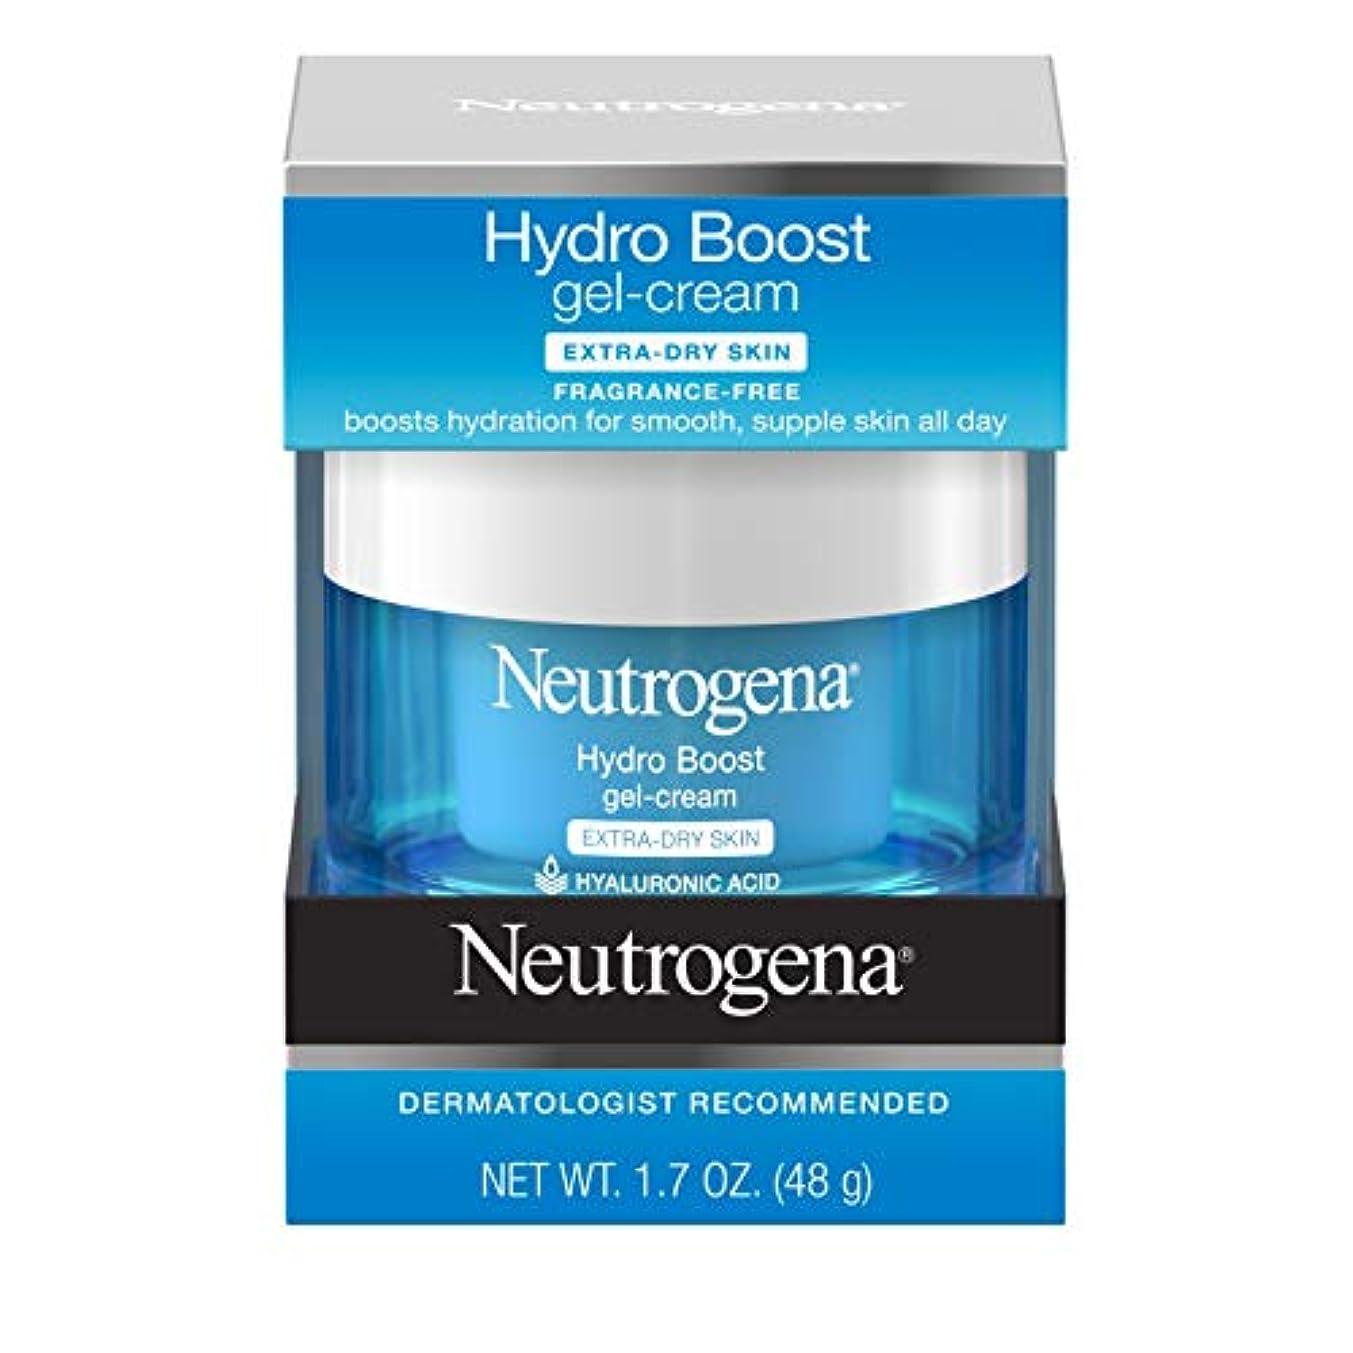 配る発音カナダNeutrogena Hydro Boost Gel Cream, Extra Dry Skin, 1.7 Ounce  海外直送品?並行輸入品